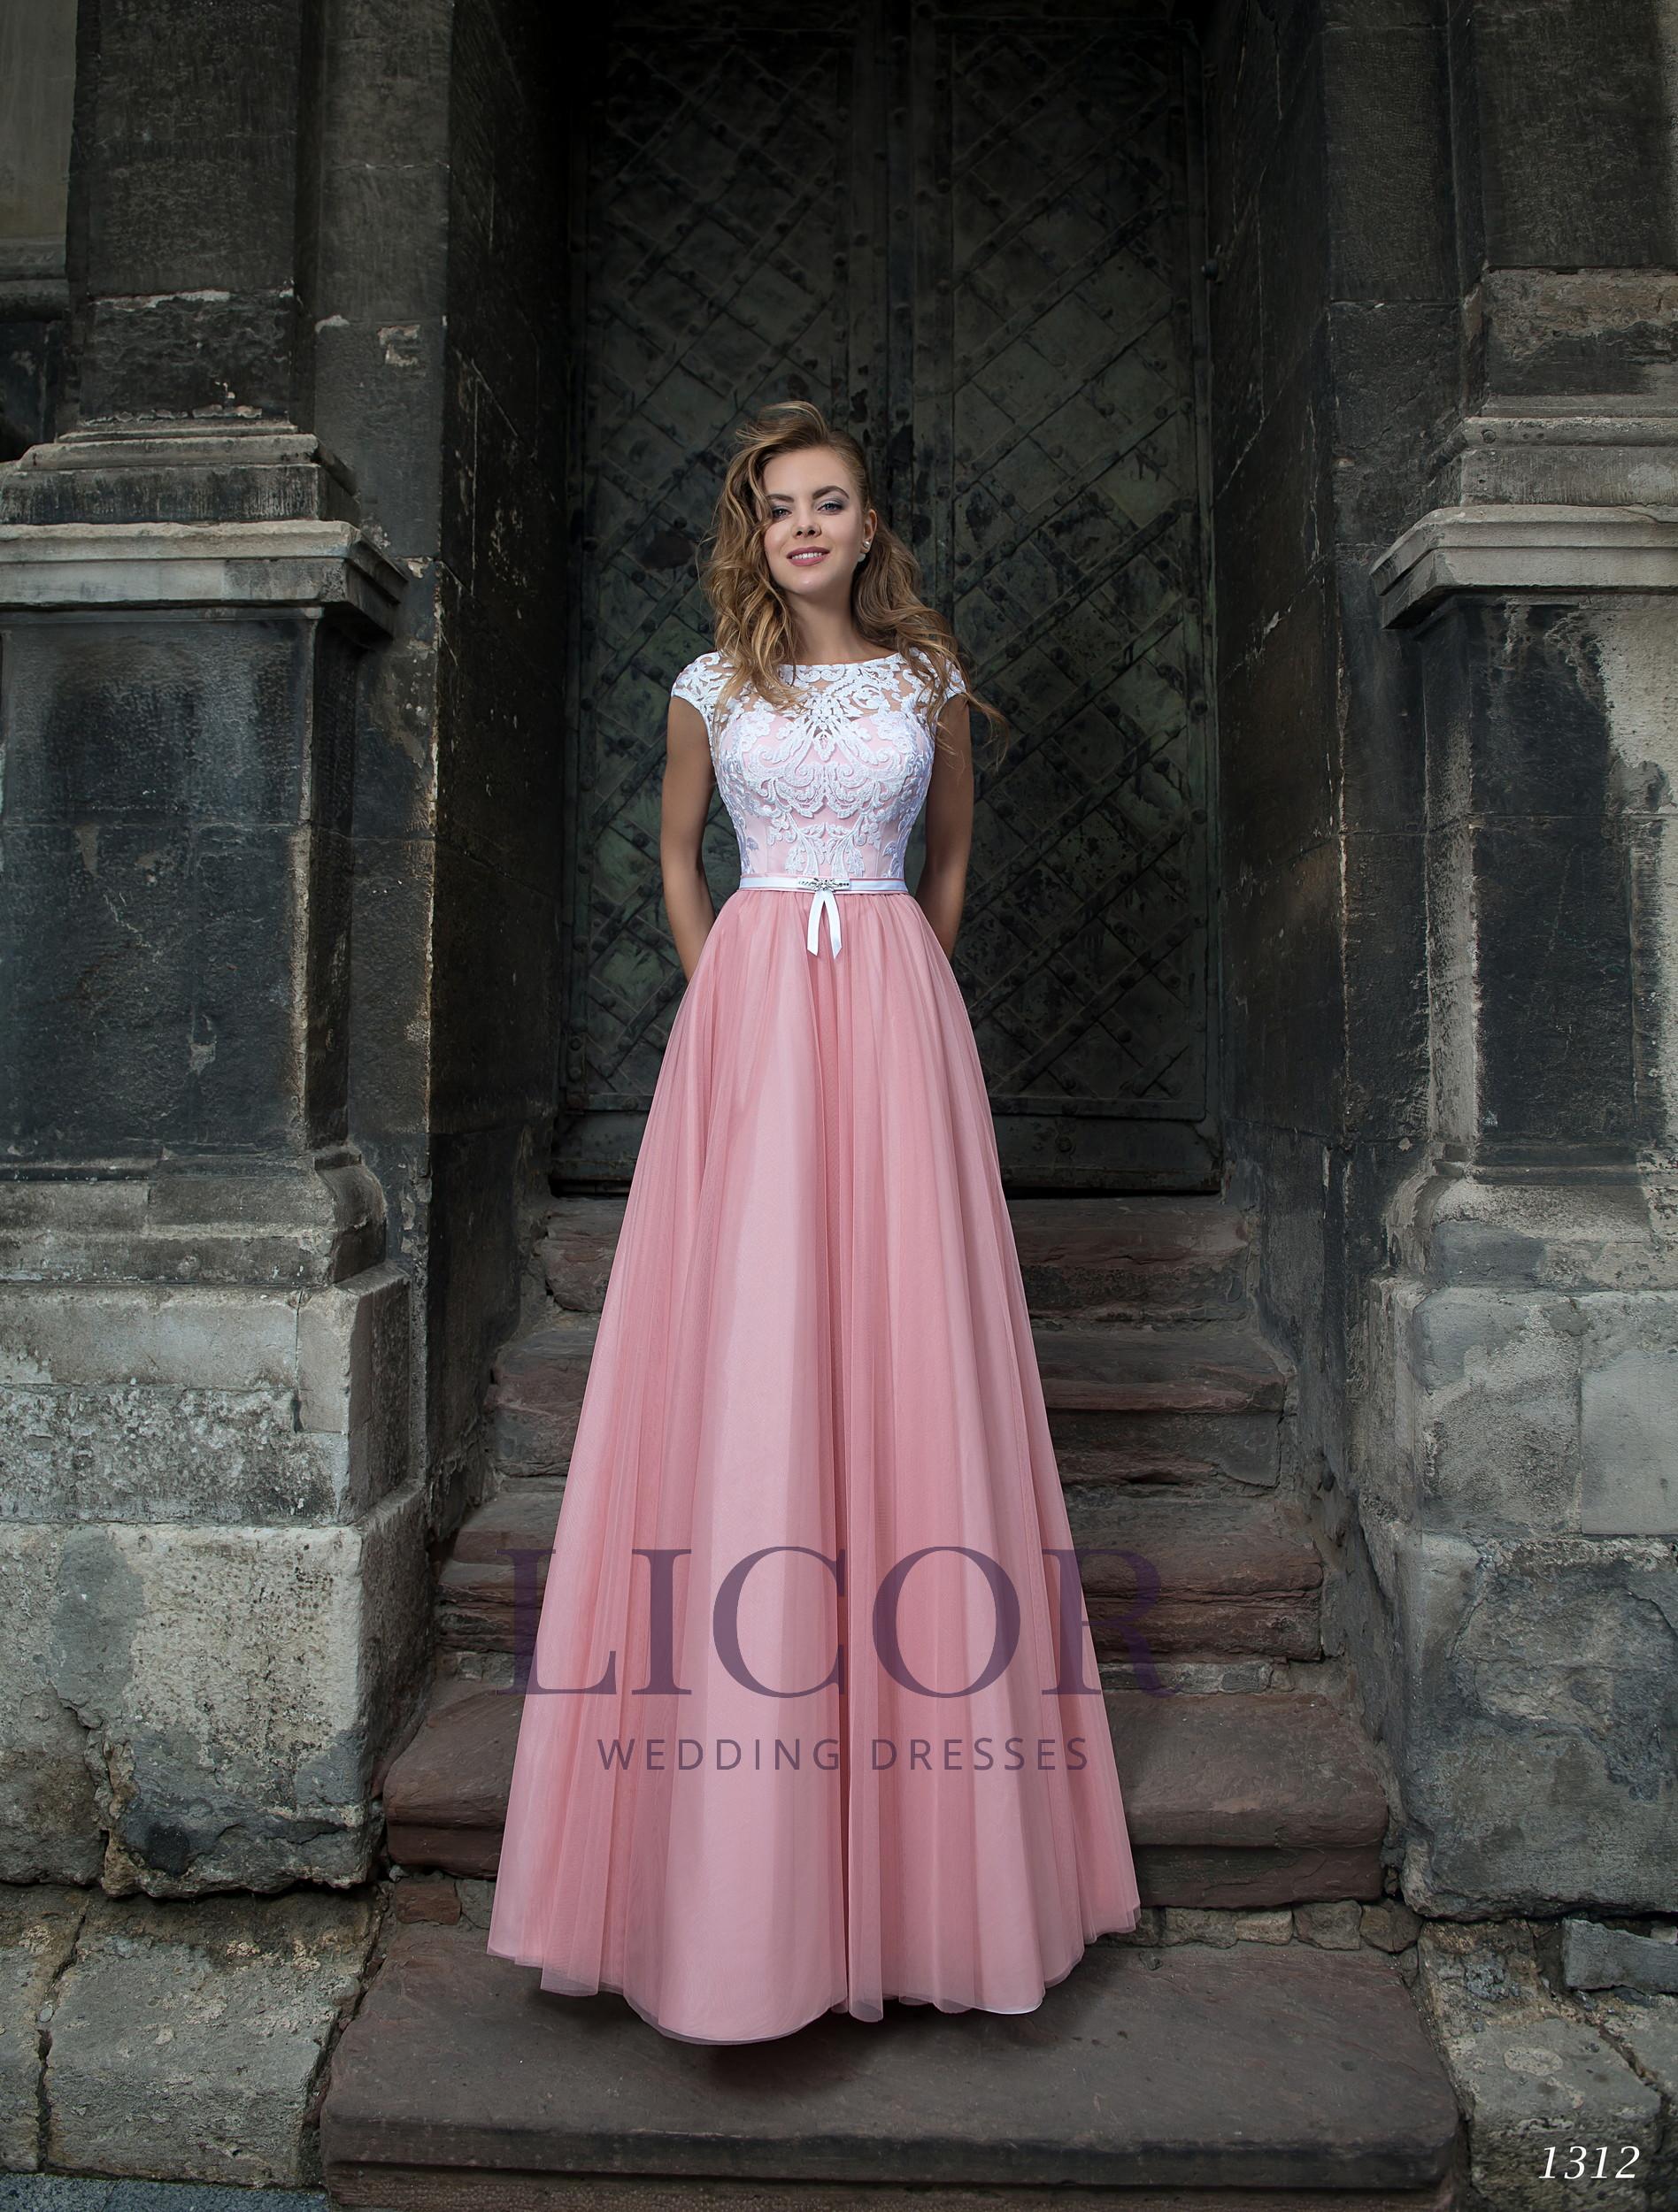 https://licor.com.ua/images/stories/virtuemart/product/1312(1).jpg